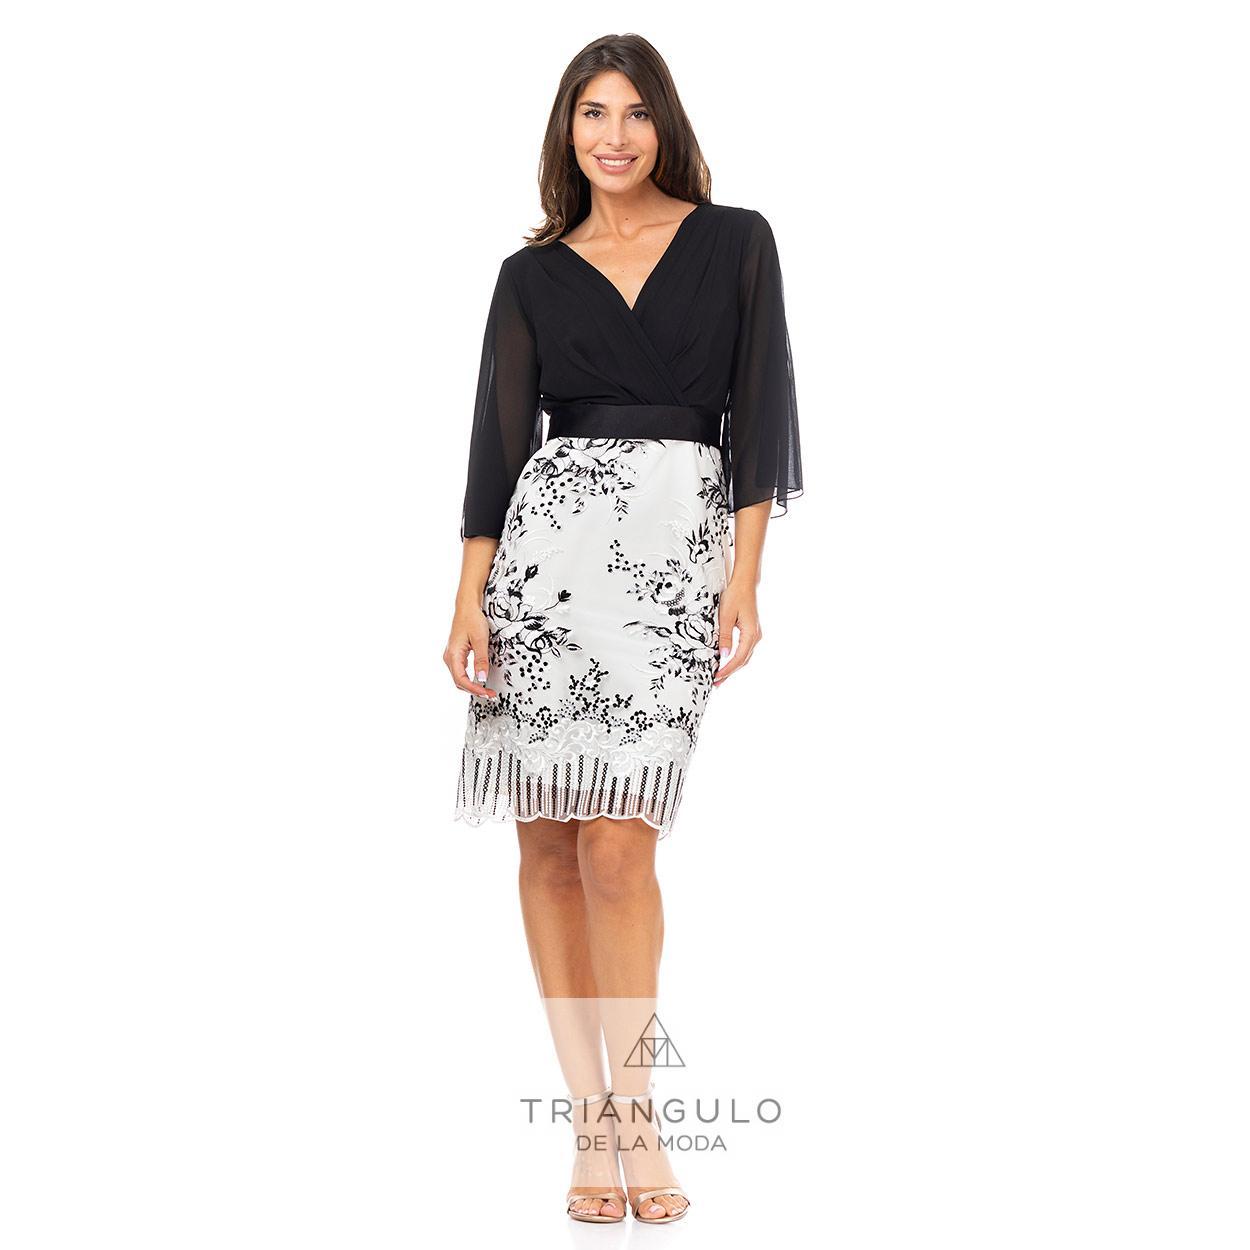 Tienda online del Triangulo de la Moda VESTIDO CORTO BLONDA GASA